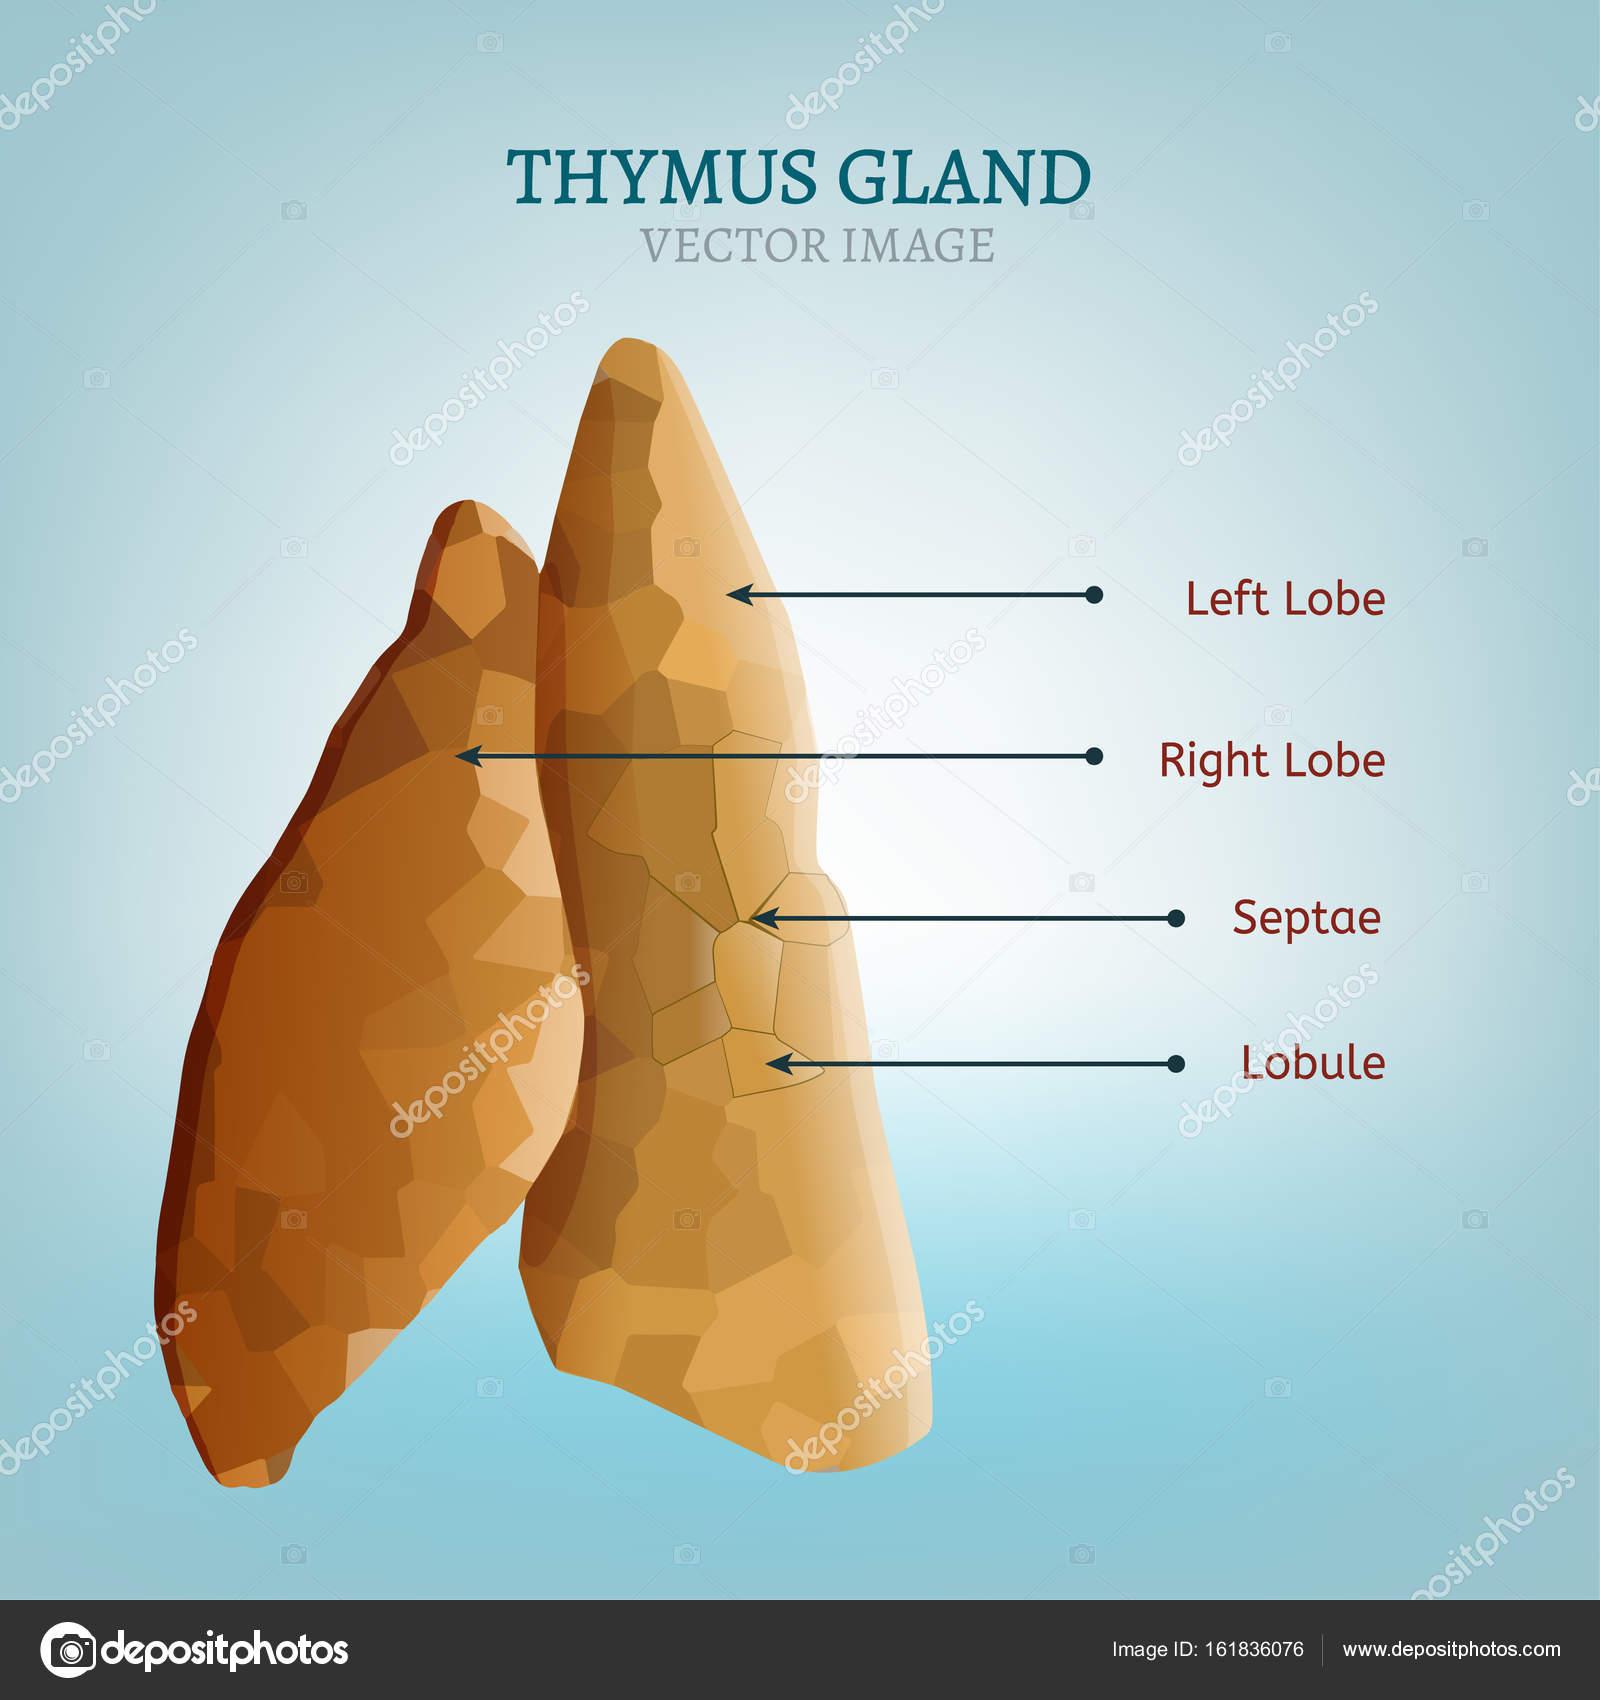 Thymus Gland Image Stock Vector Annyart 161836076